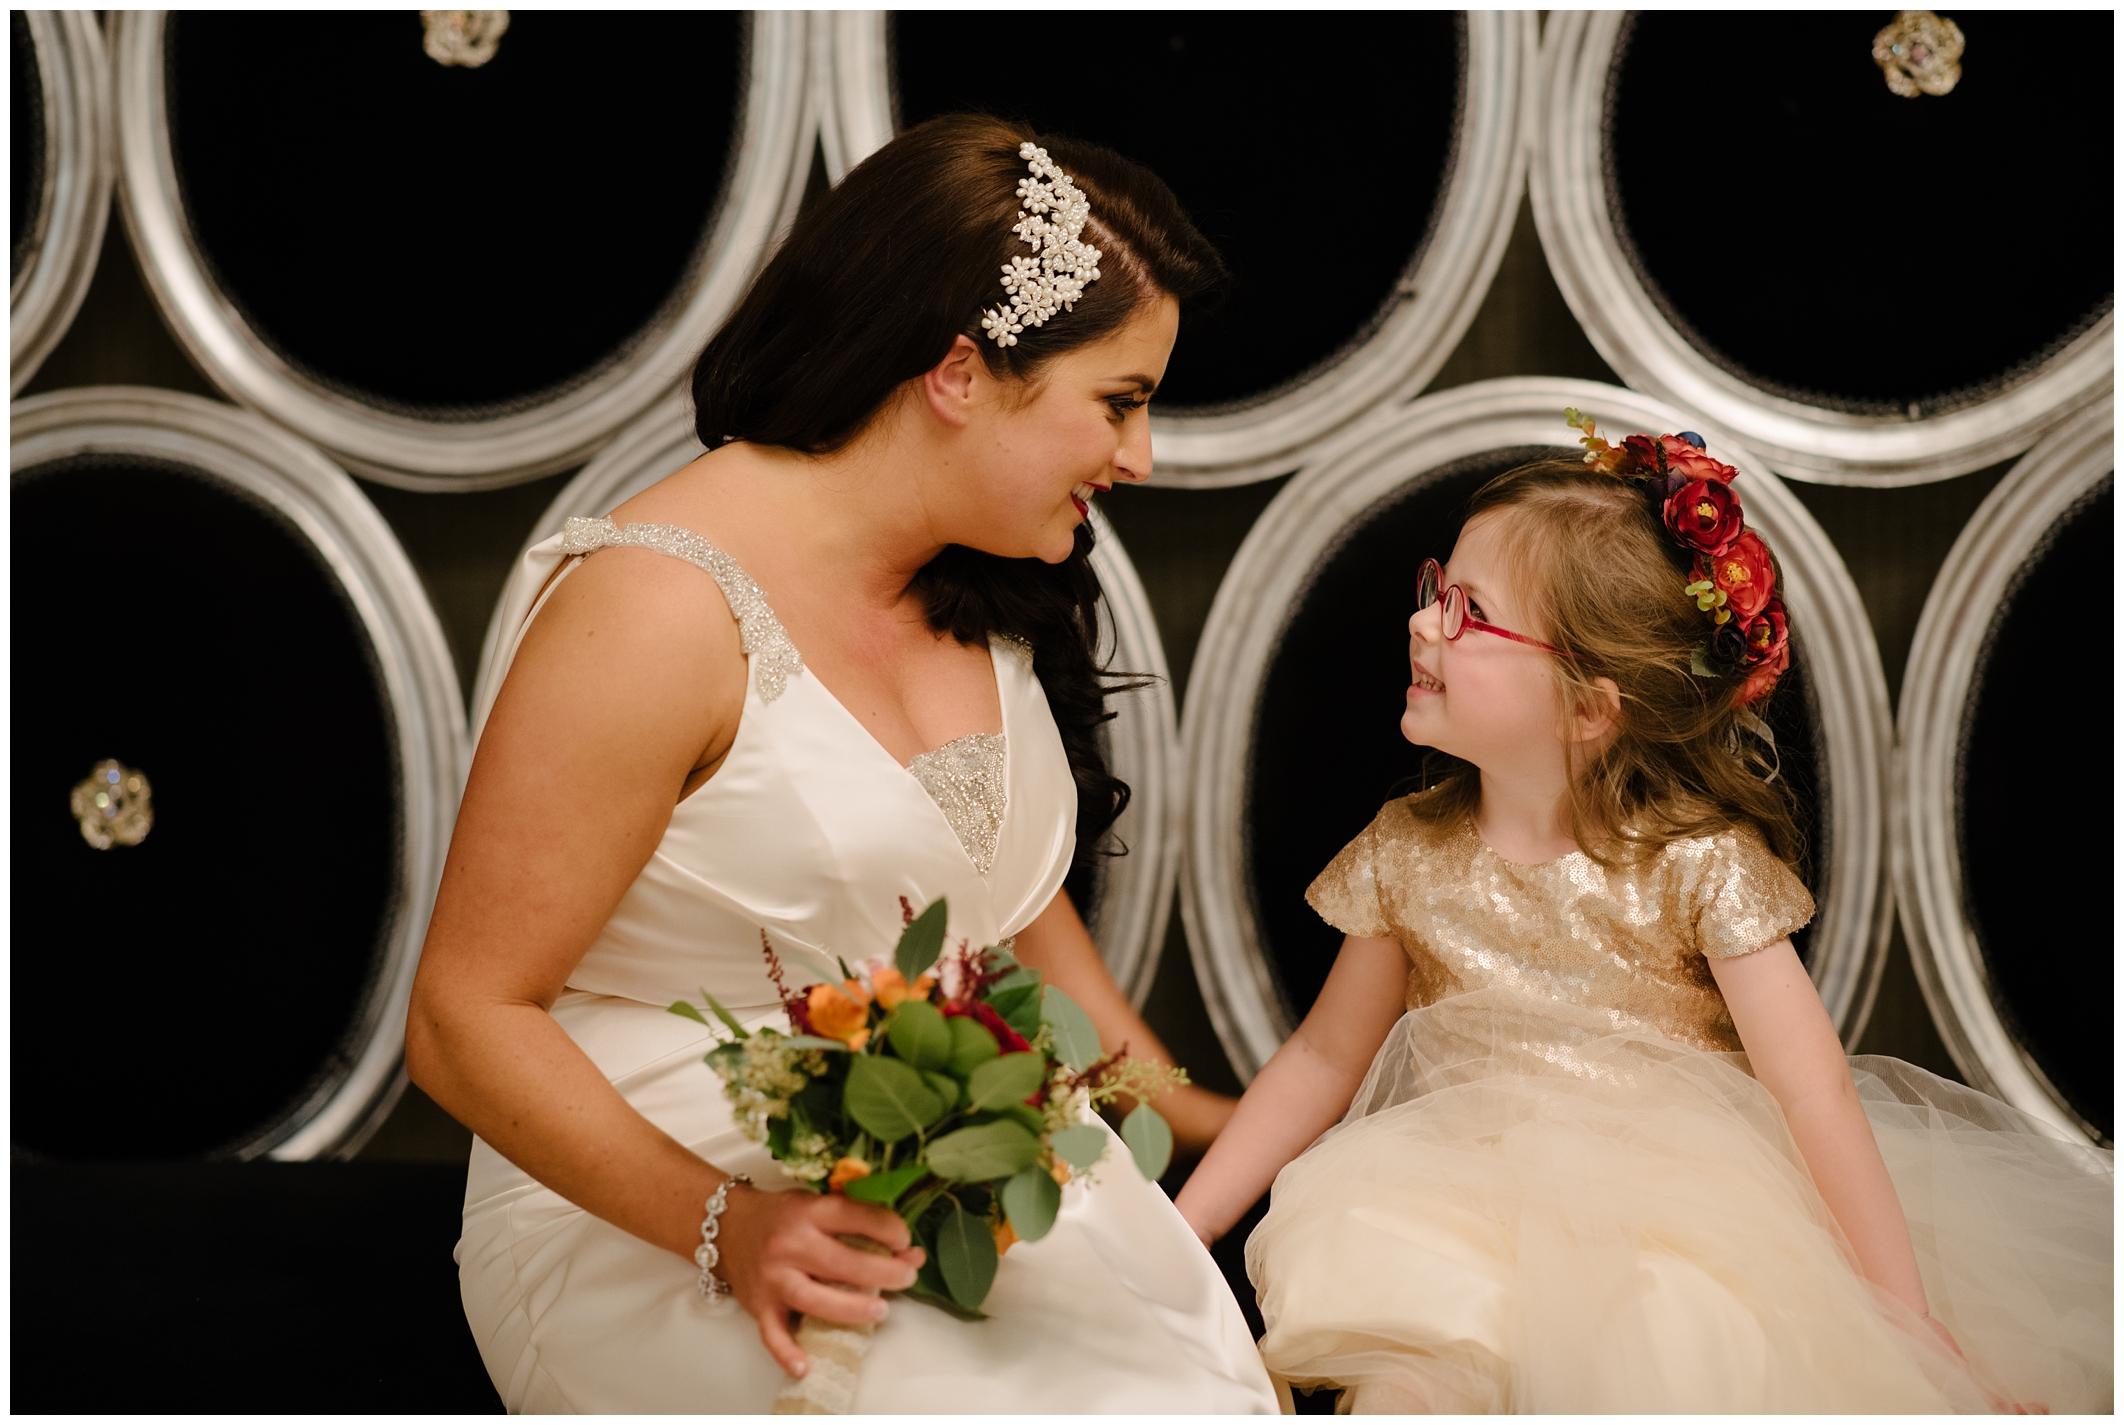 tracey_conor__wedding_jude_browne_photography_0073.jpg